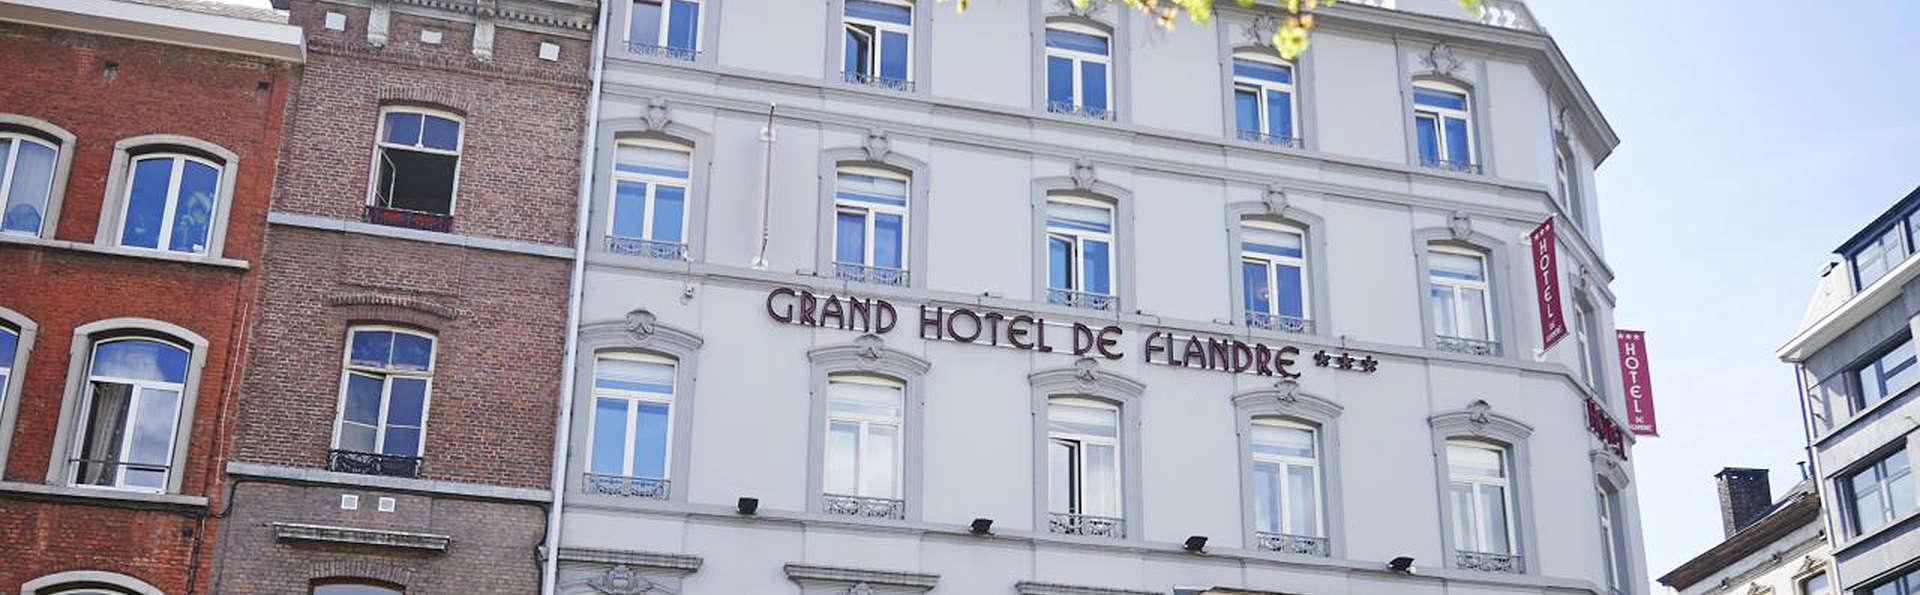 Grand Hotel de Flandre - EDIT_Exterior2.jpg